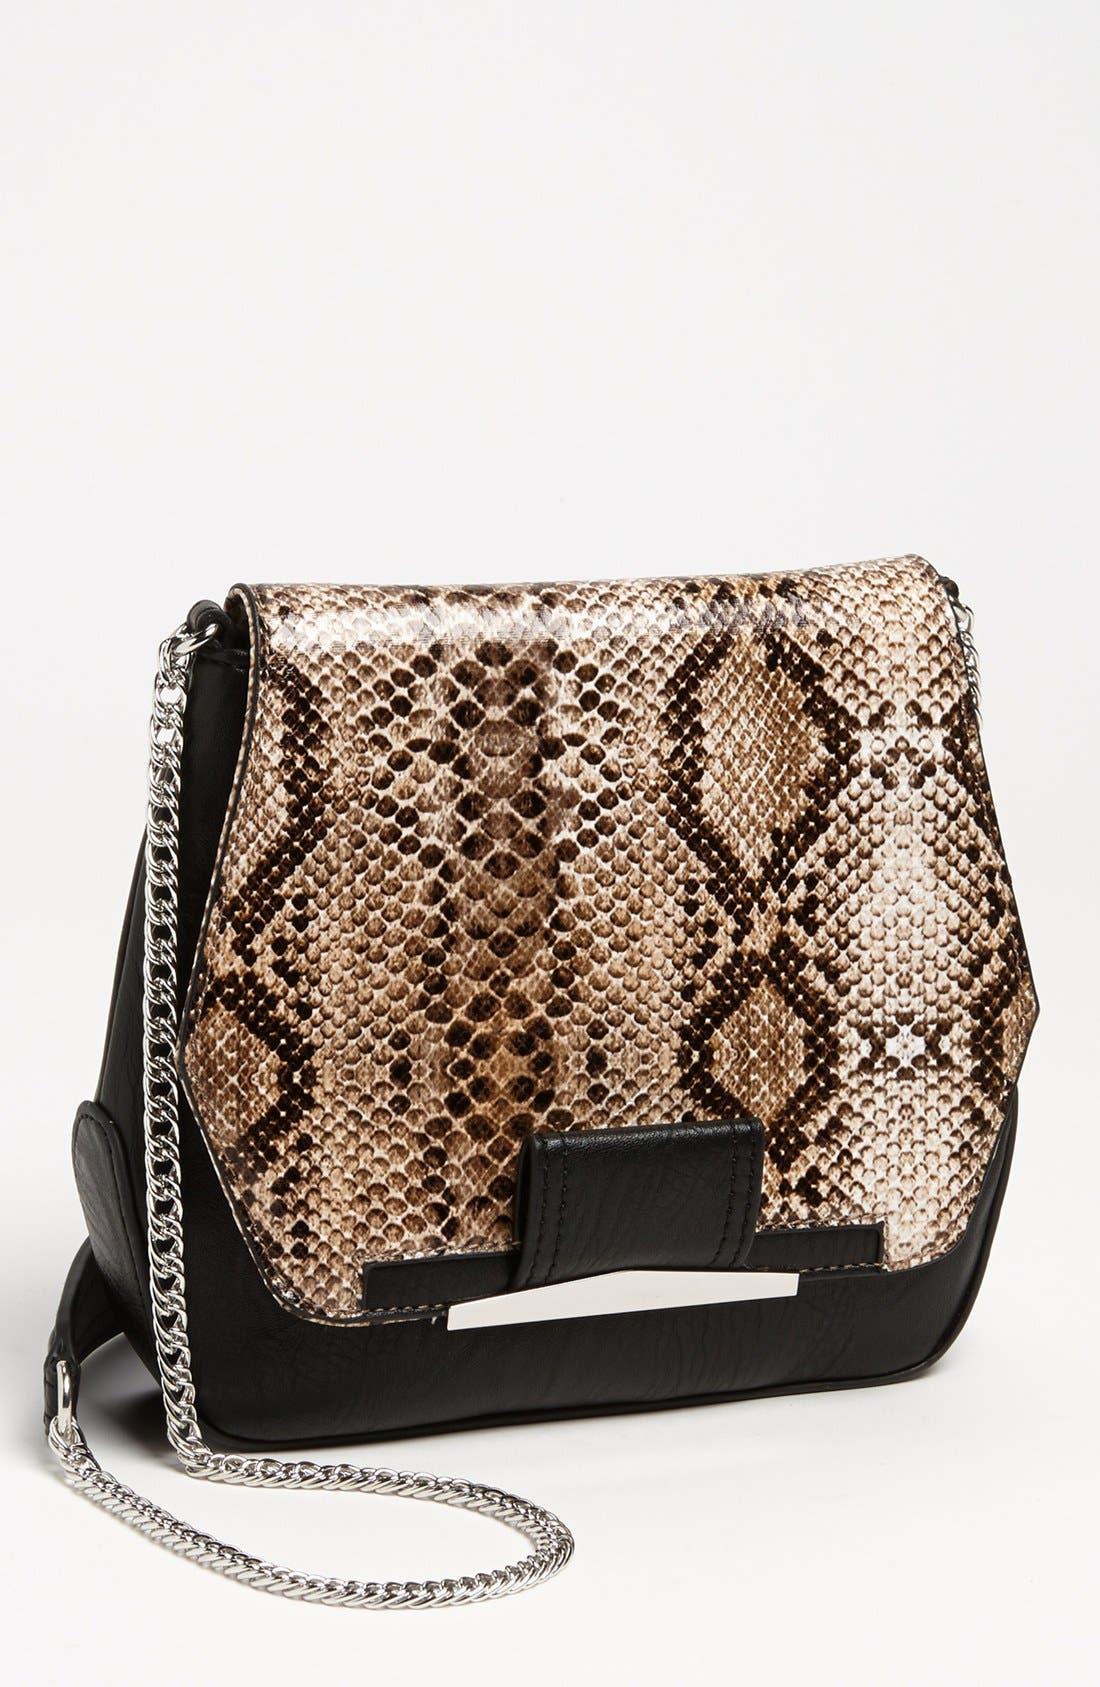 Alternate Image 1 Selected - Danielle Nicole 'Bella' Crossbody Bag